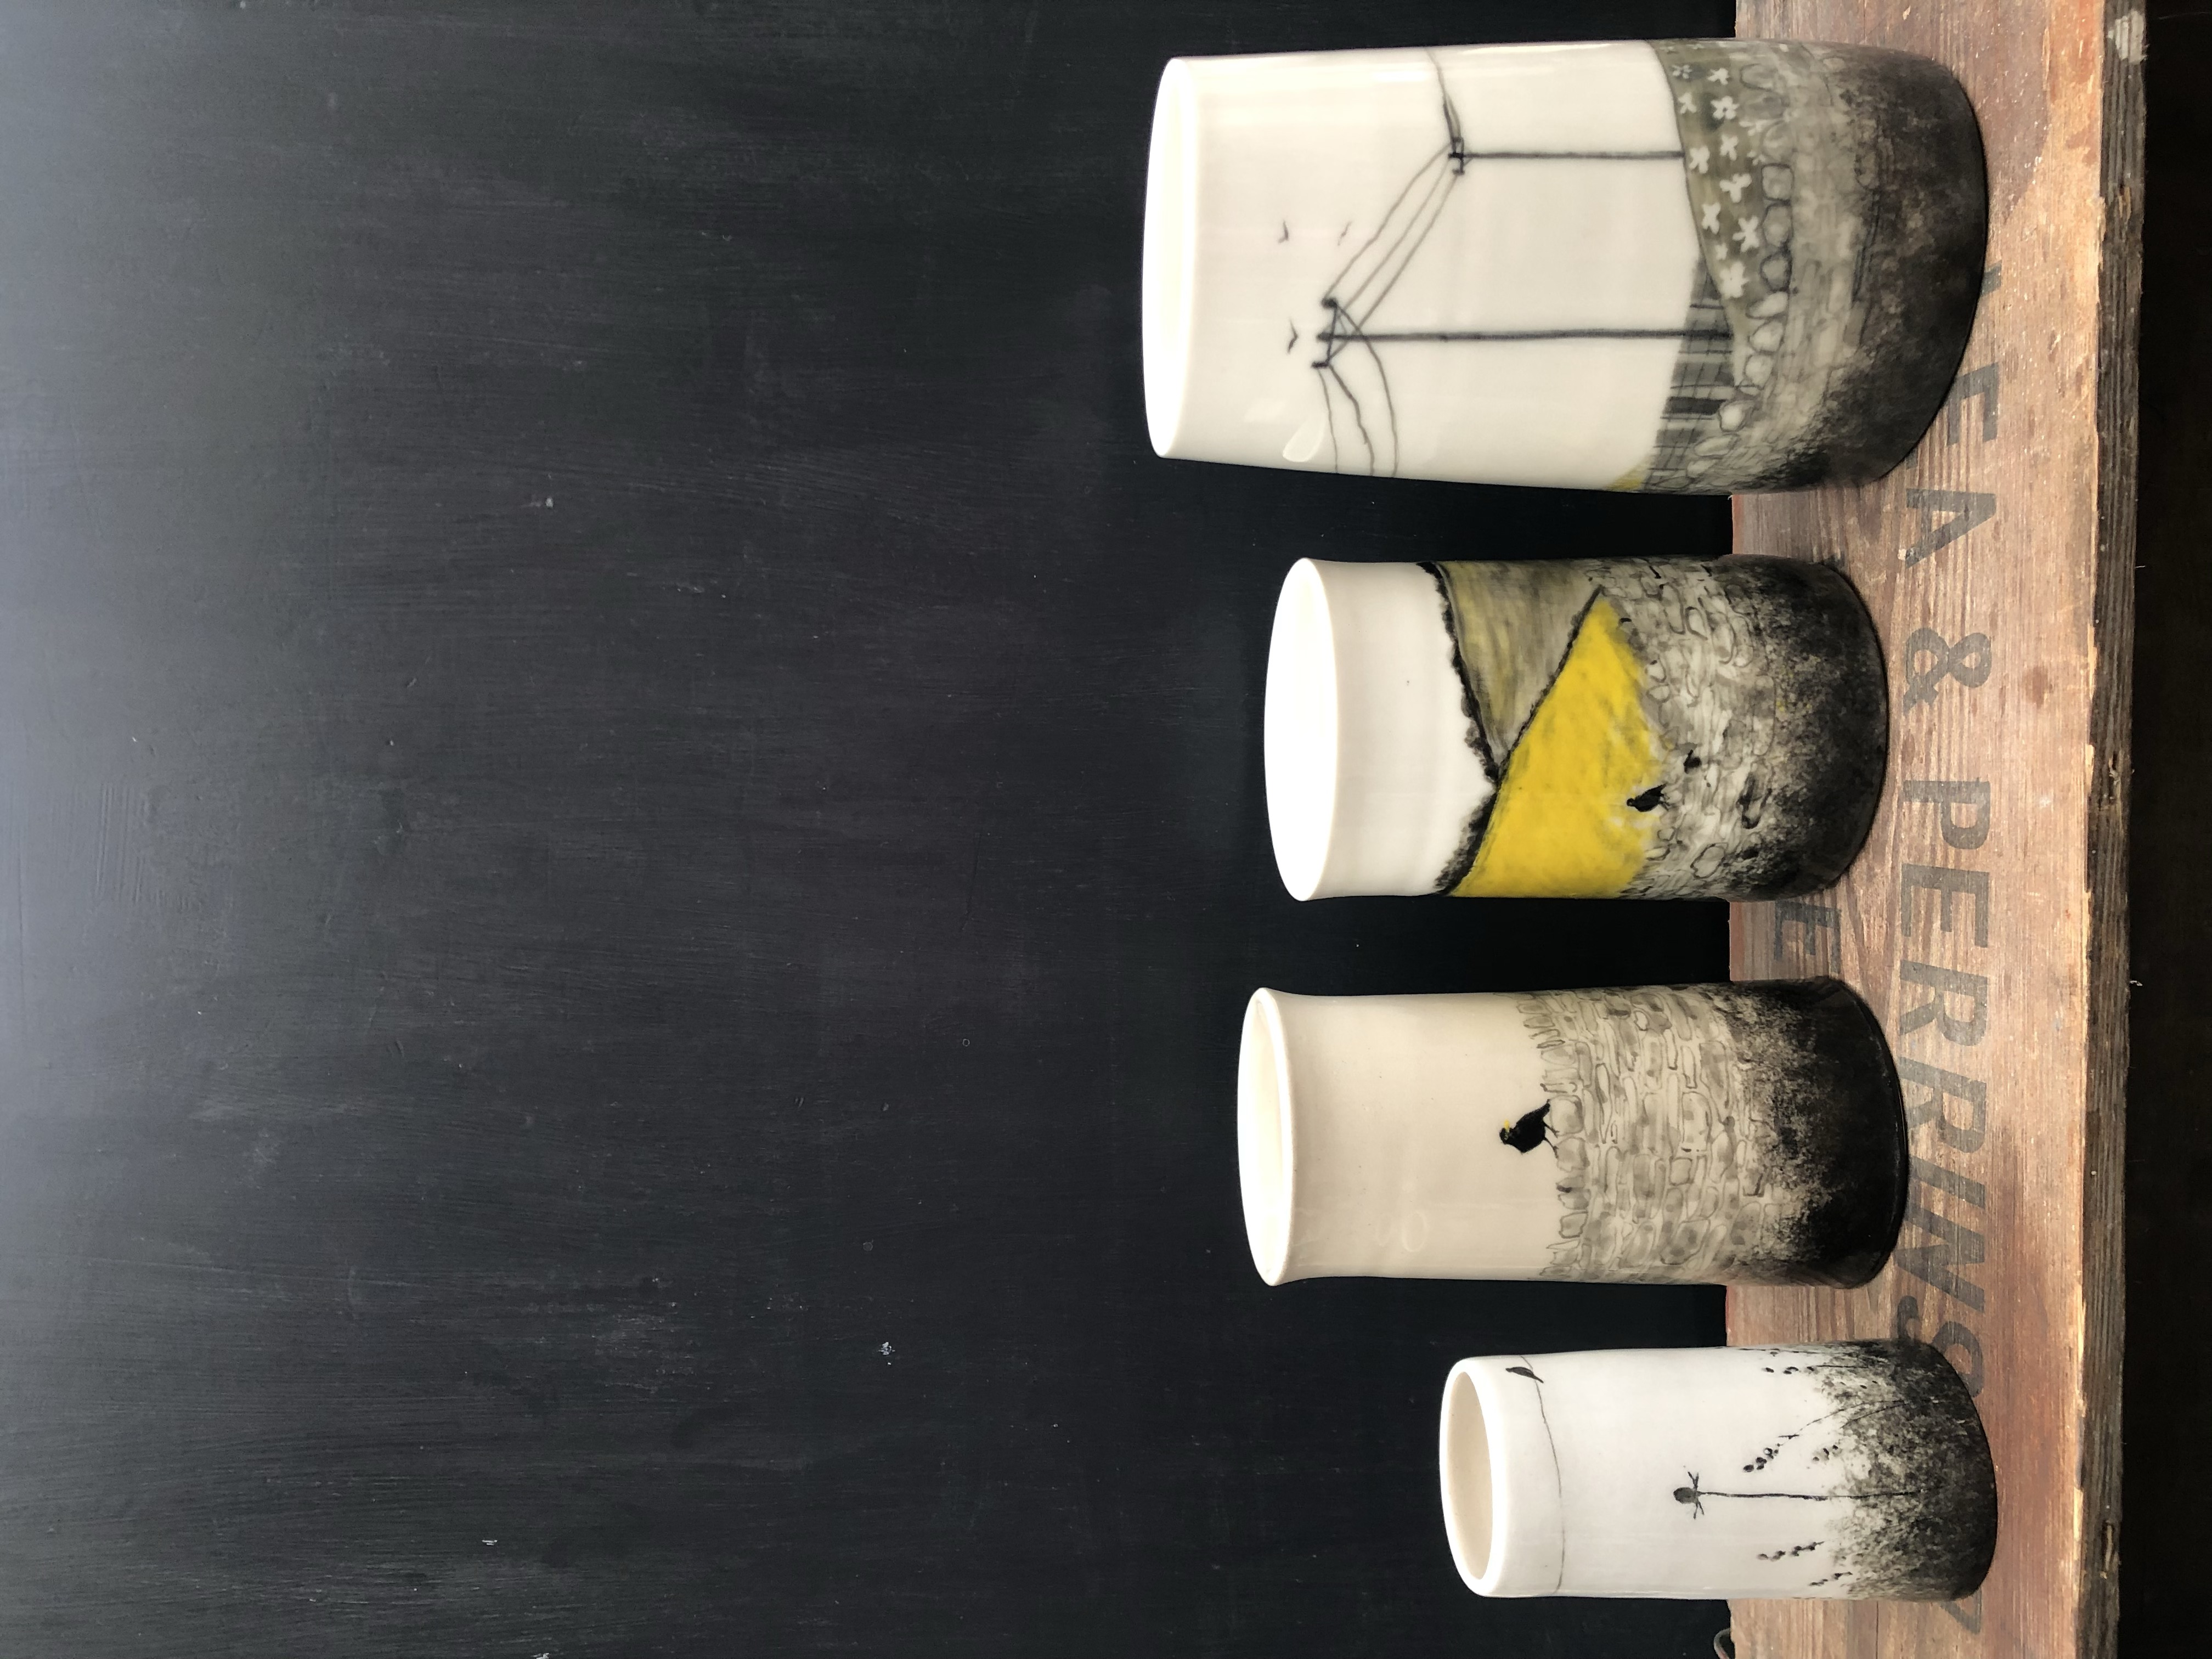 Glazed vases